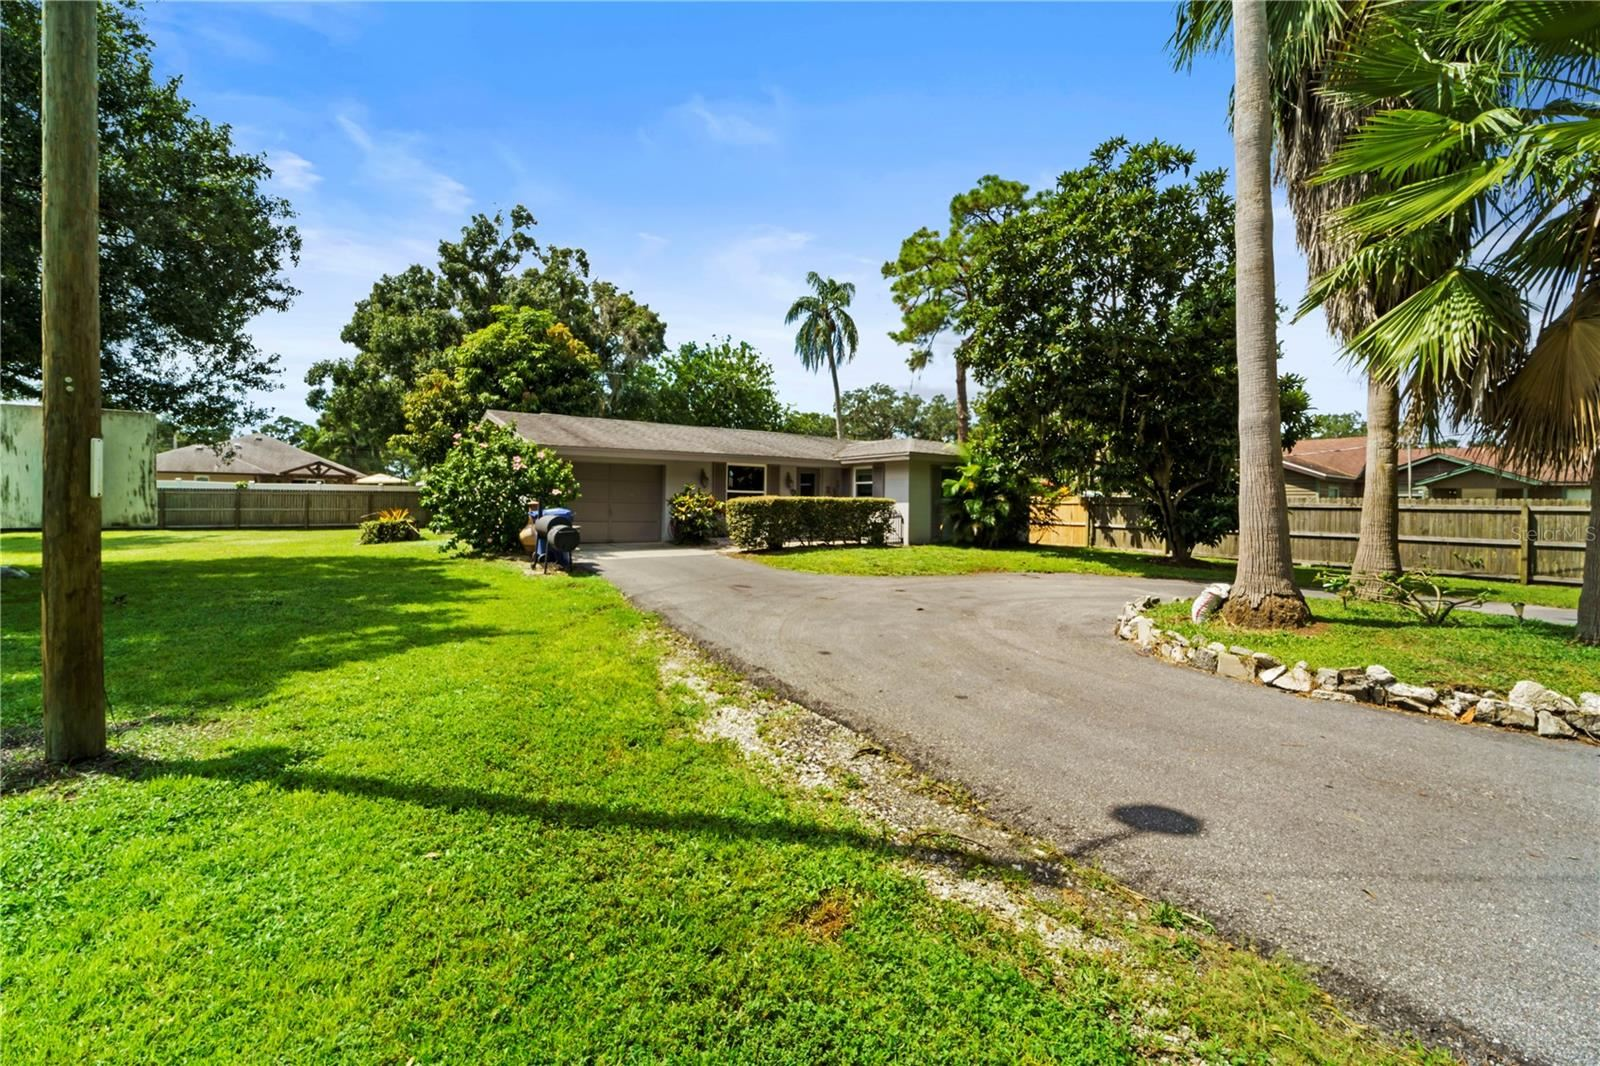 419 HOULE AVENUE, Sarasota, FL 34232 - #: A4512512